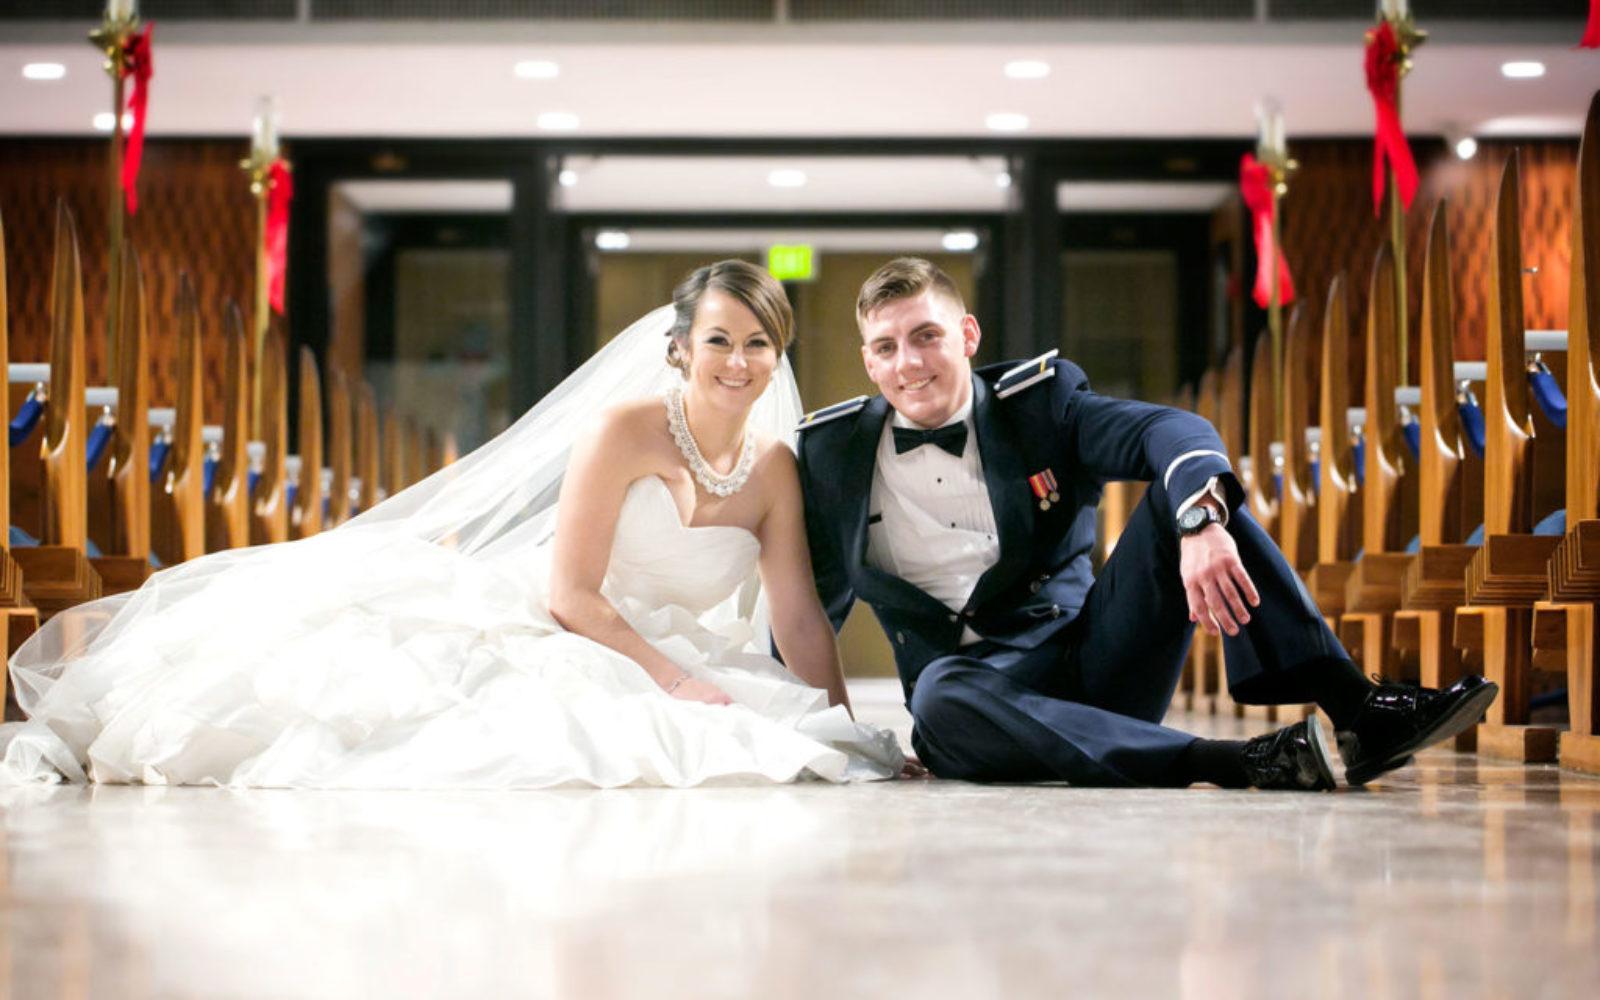 weddingphotographycoloradosprings_53-1024x640